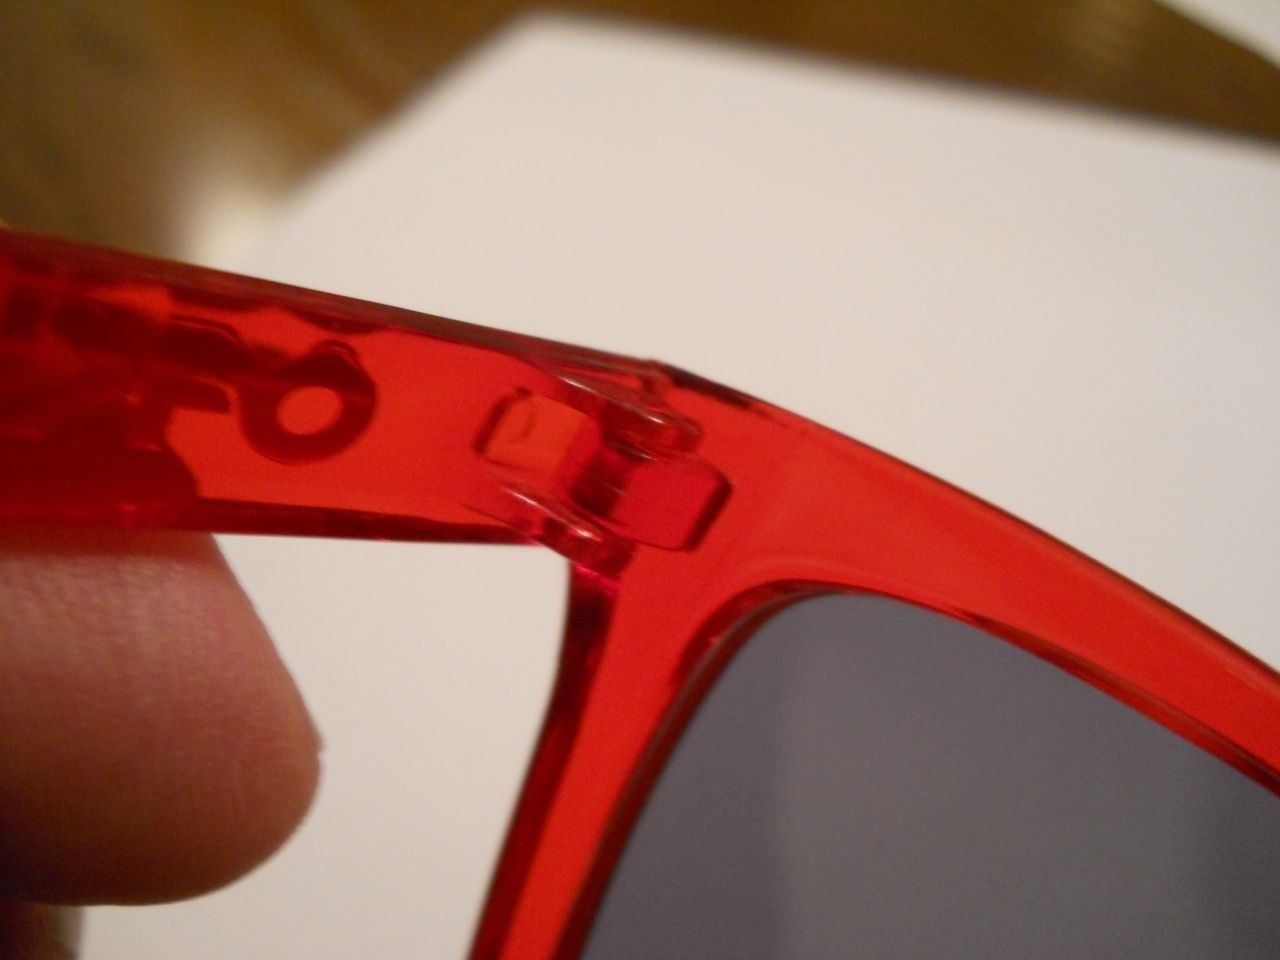 Crystal Red Frogskins - Real Or Fake? - rl86.jpg